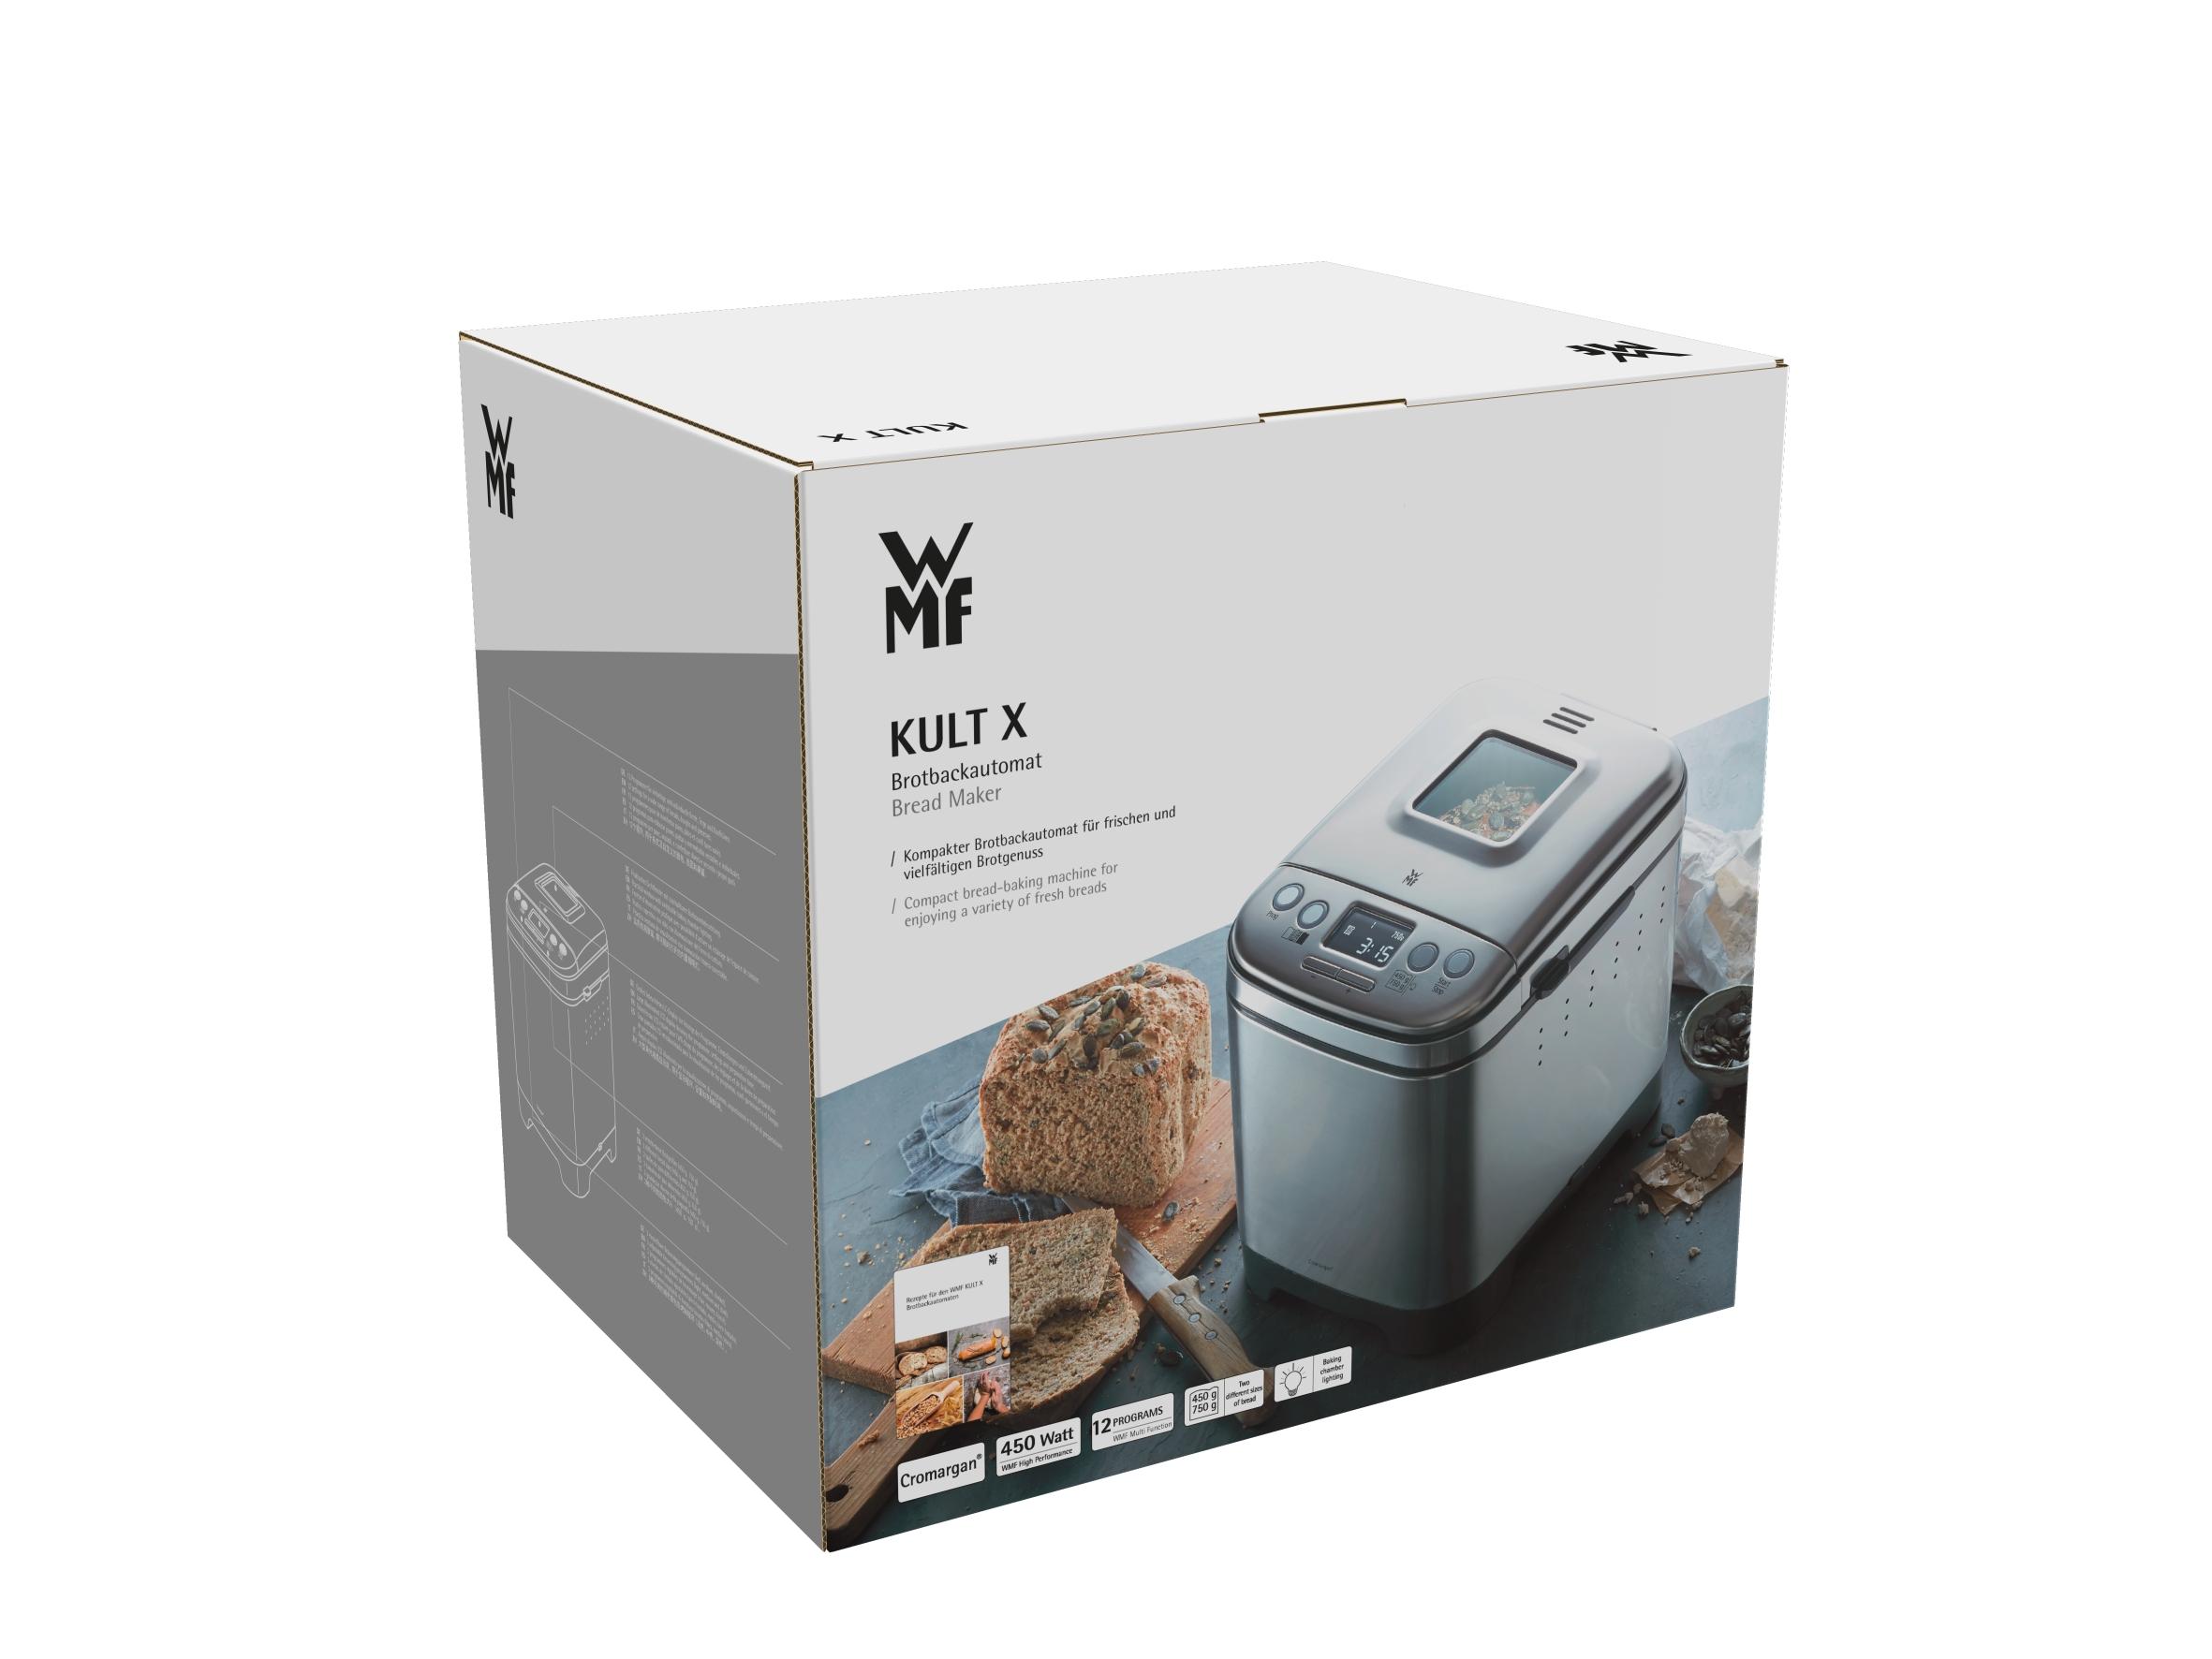 WMF Kult X Ekmek Yapma Makinesi